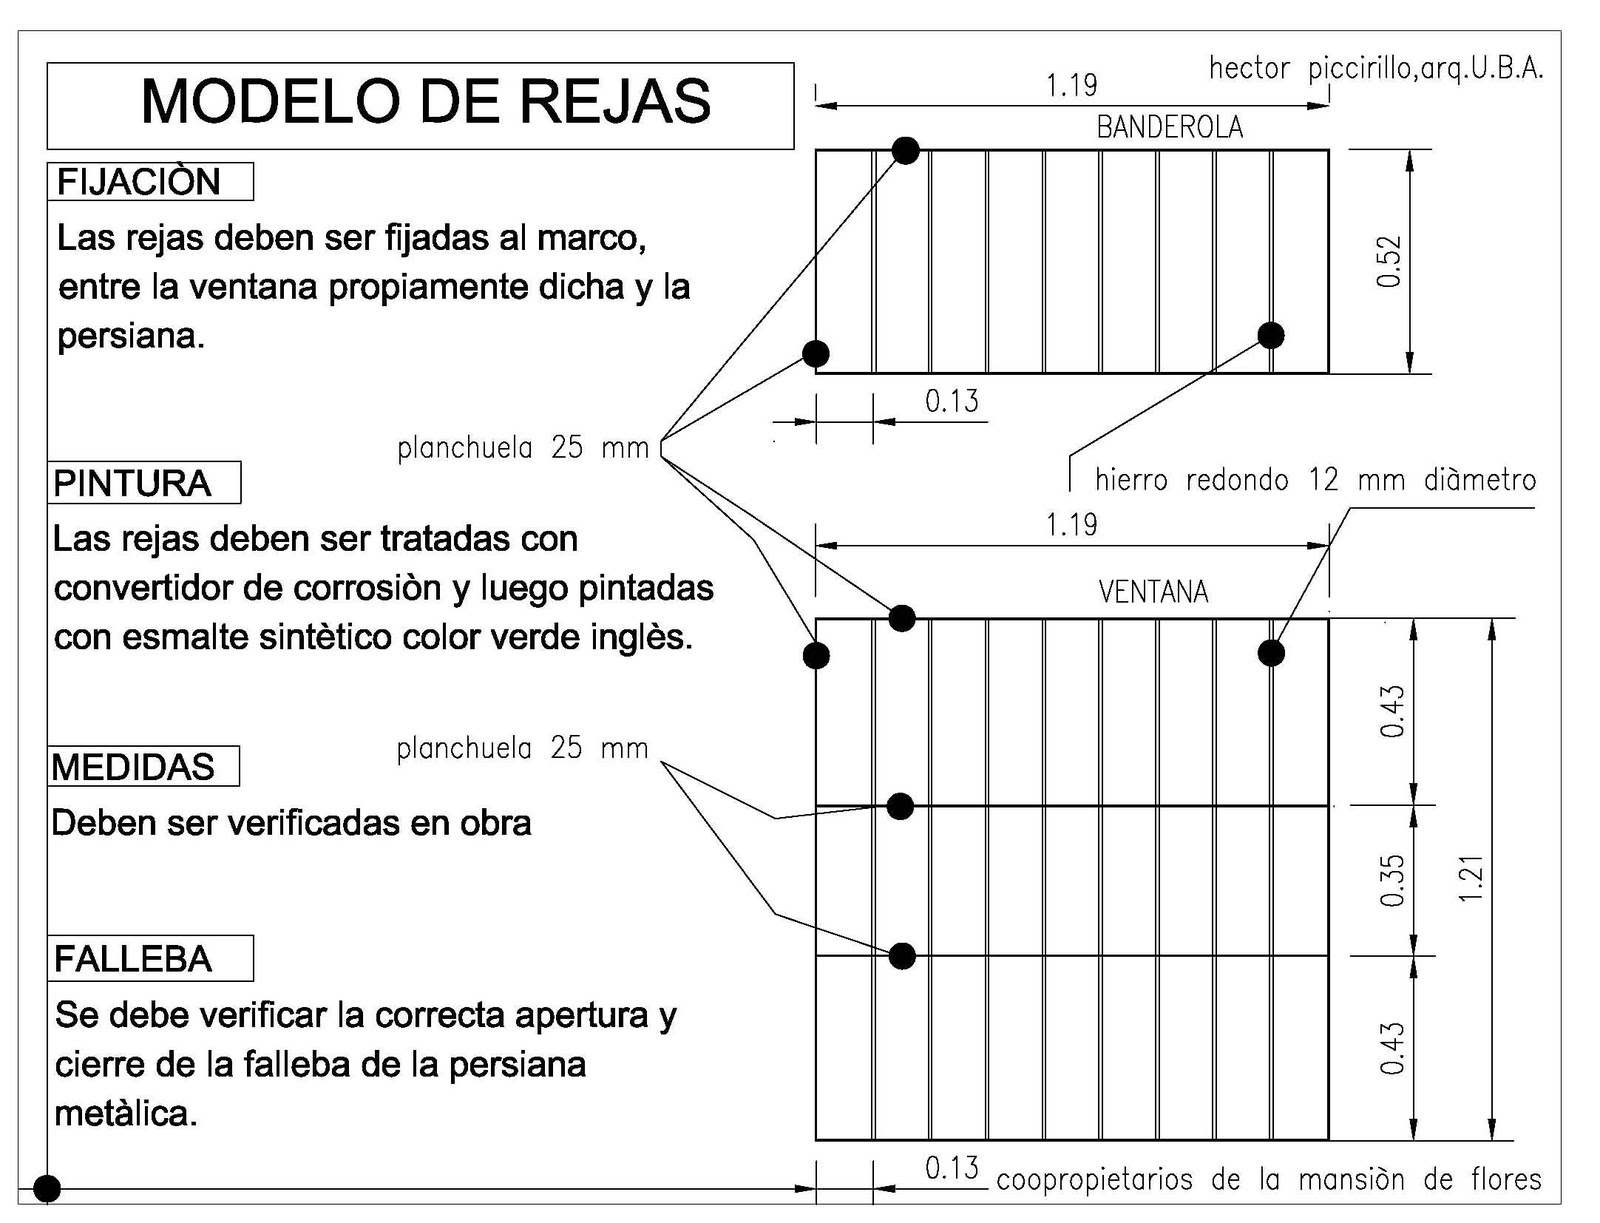 Frentes casas con rejas para proteccion fabrica com portal - Rejas para casas ...